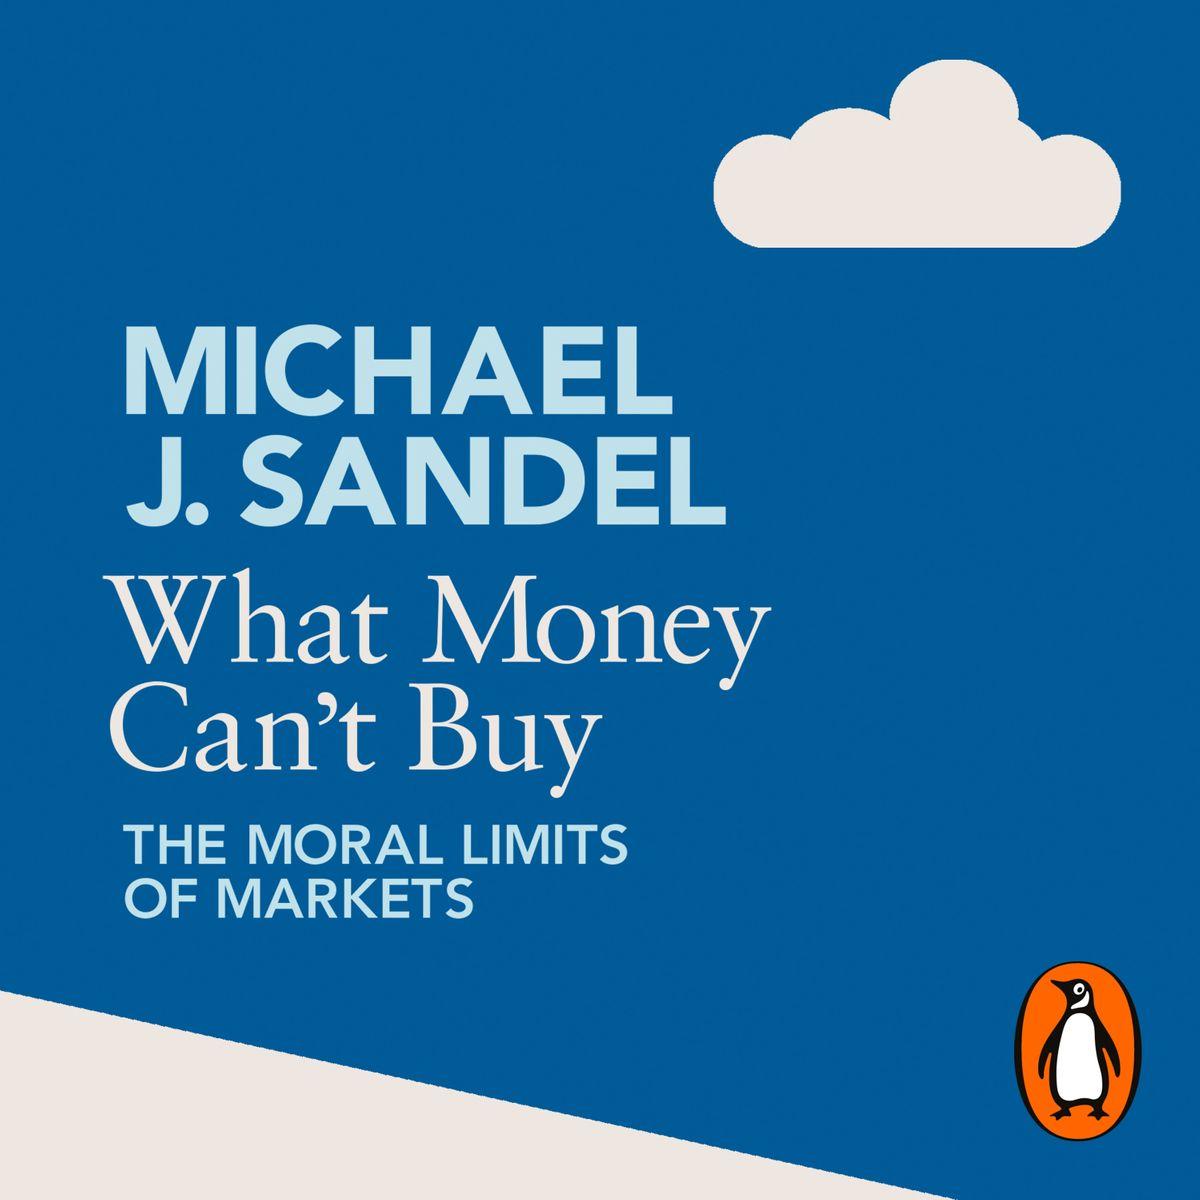 Michael J. Sandel - What Money Can't Buy BookZyfa